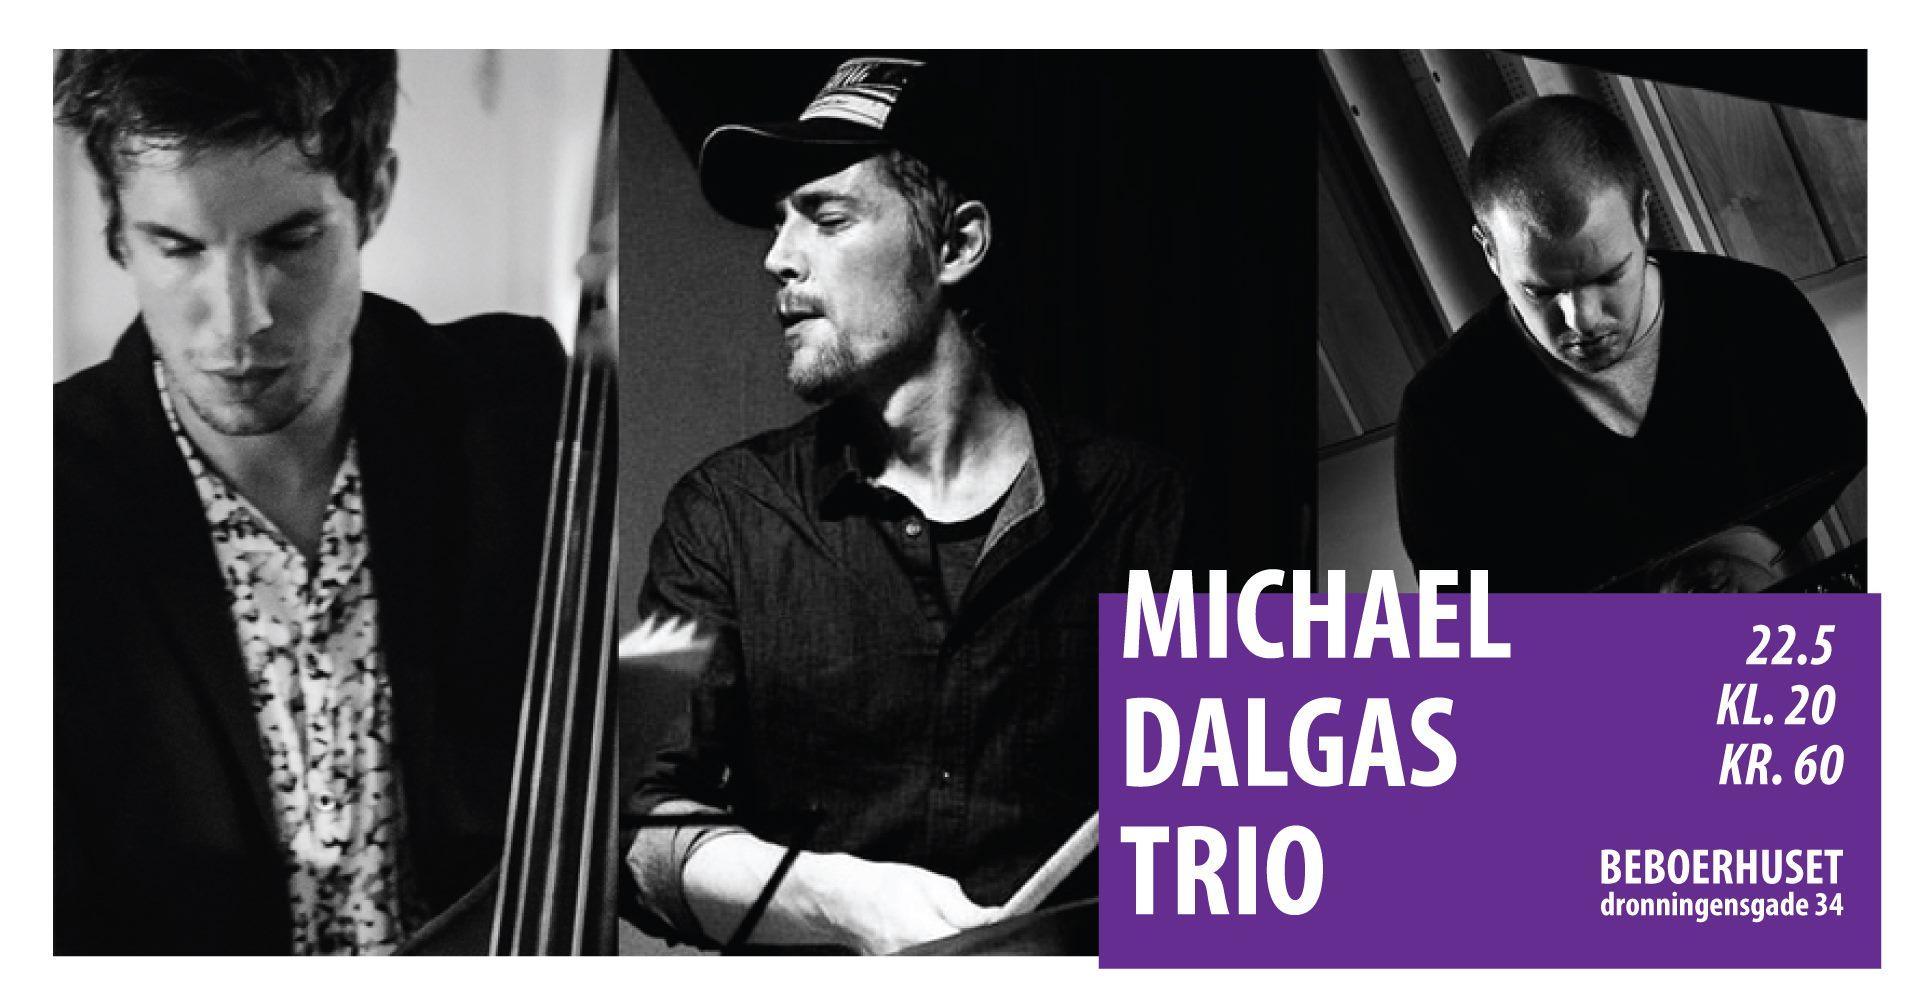 Michael Dalgas Trio